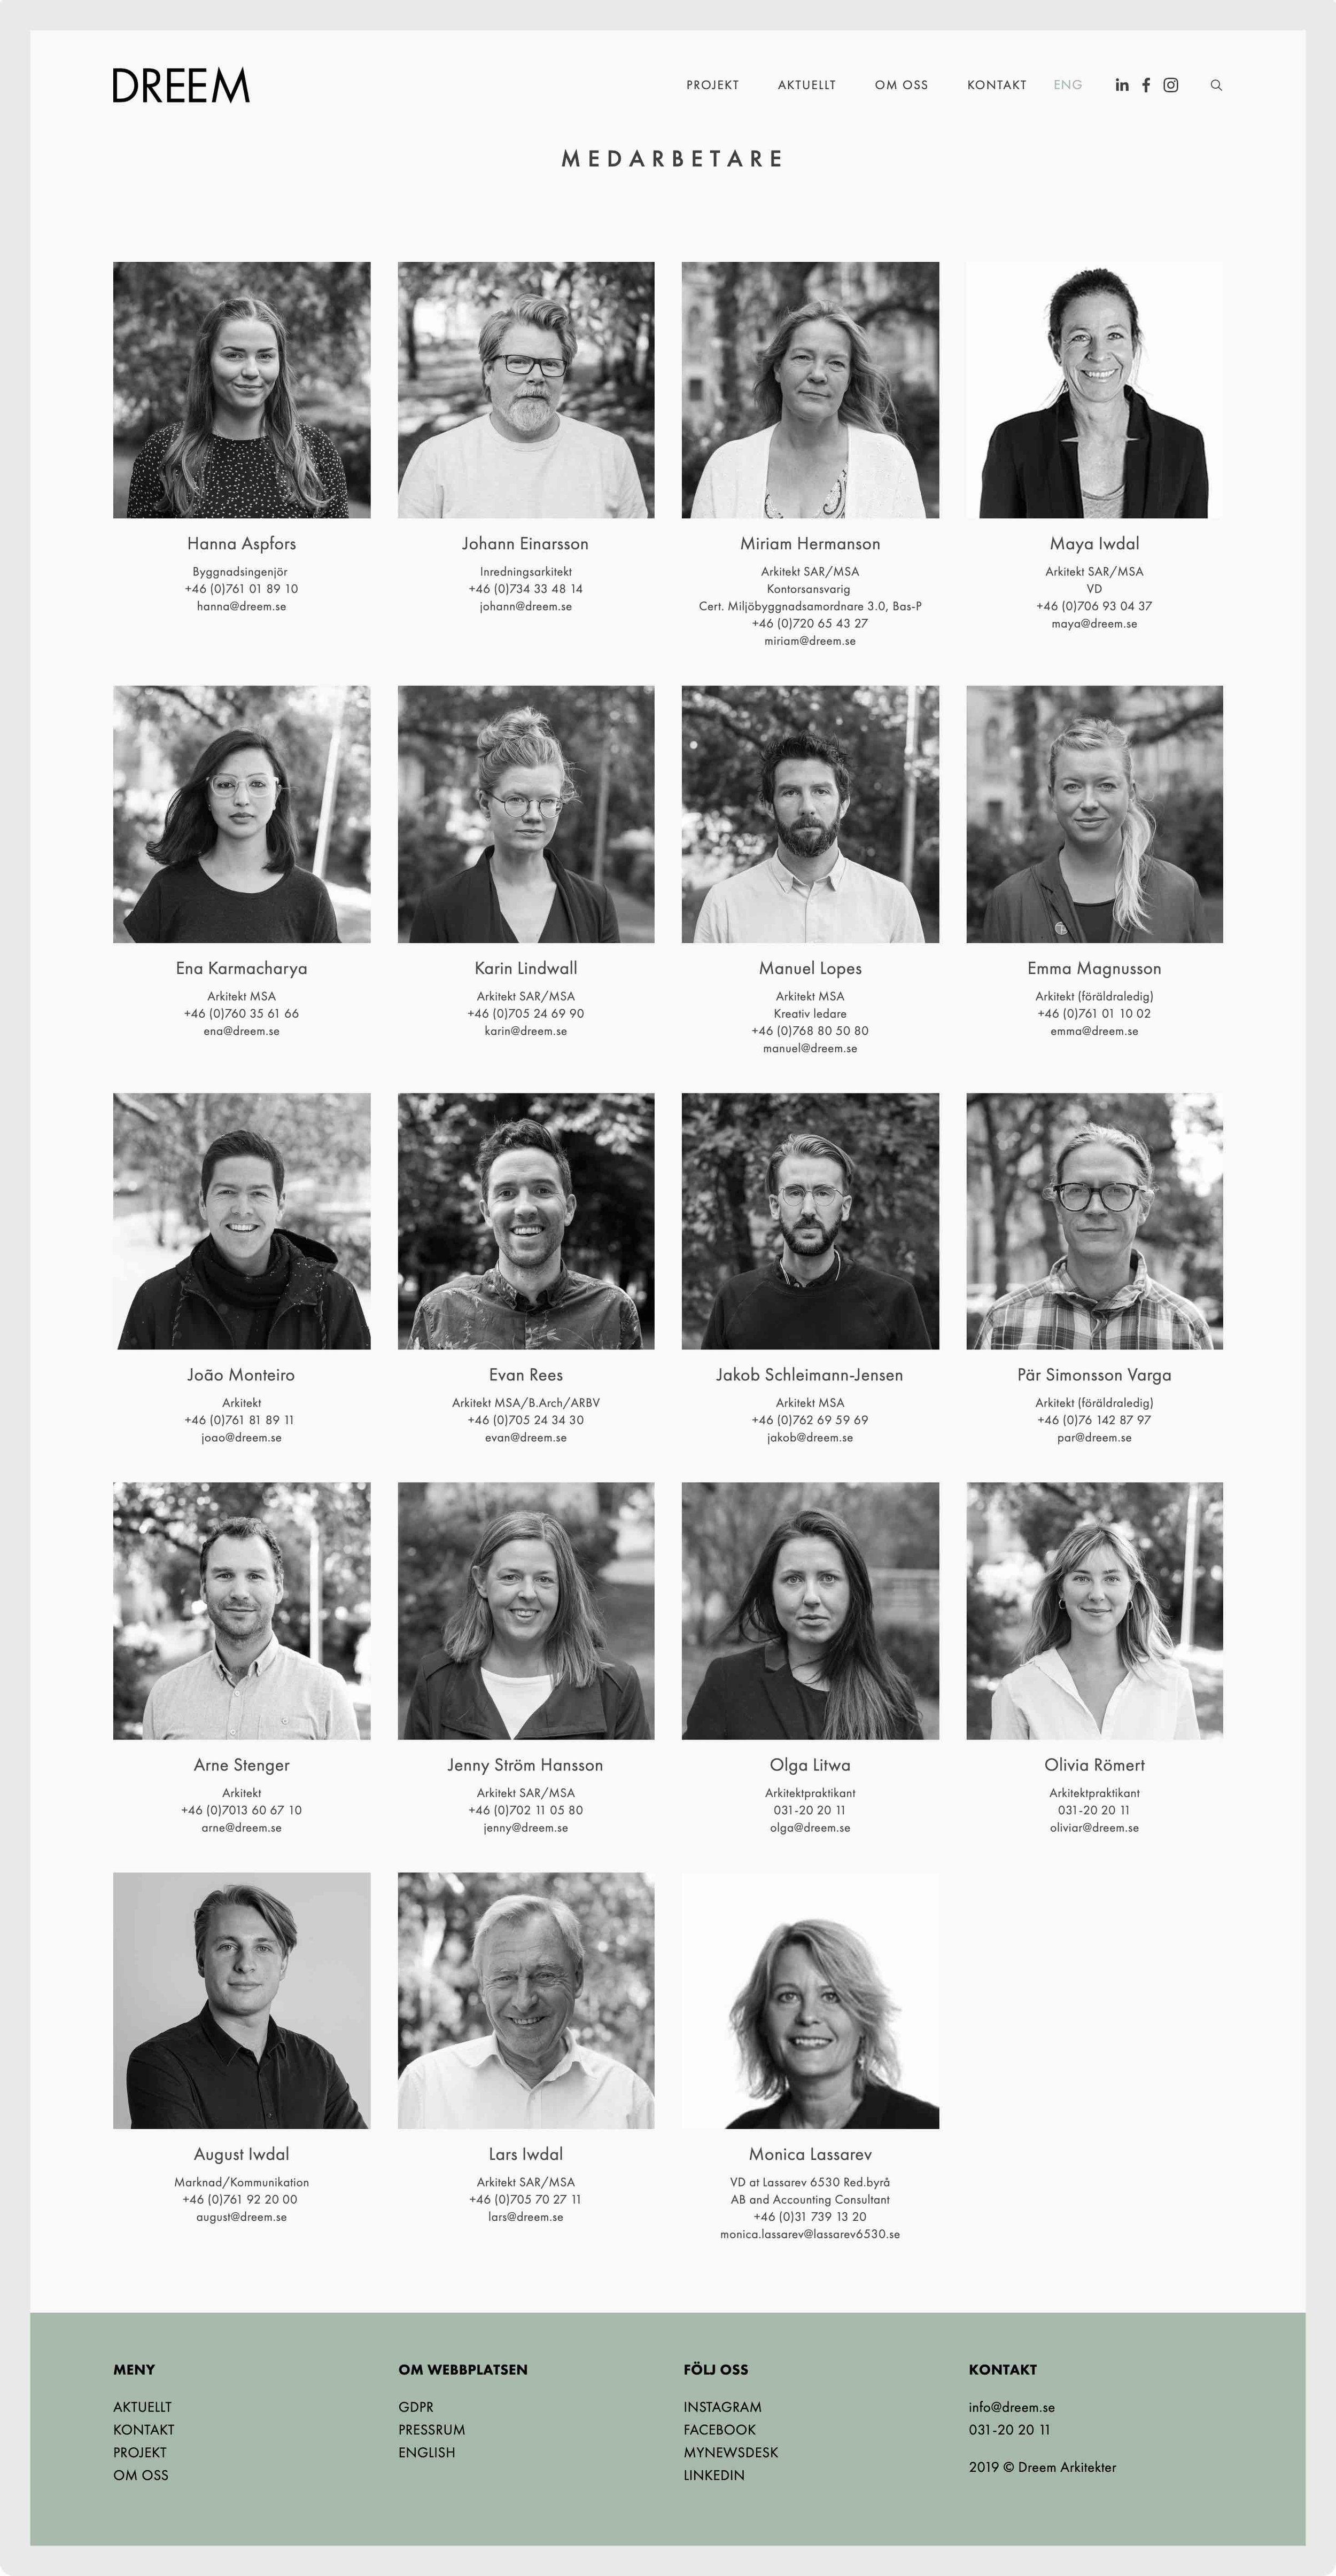 framtidens-webbyrå-uppdrag-dreem-arkitektur-medarbetare.jpg